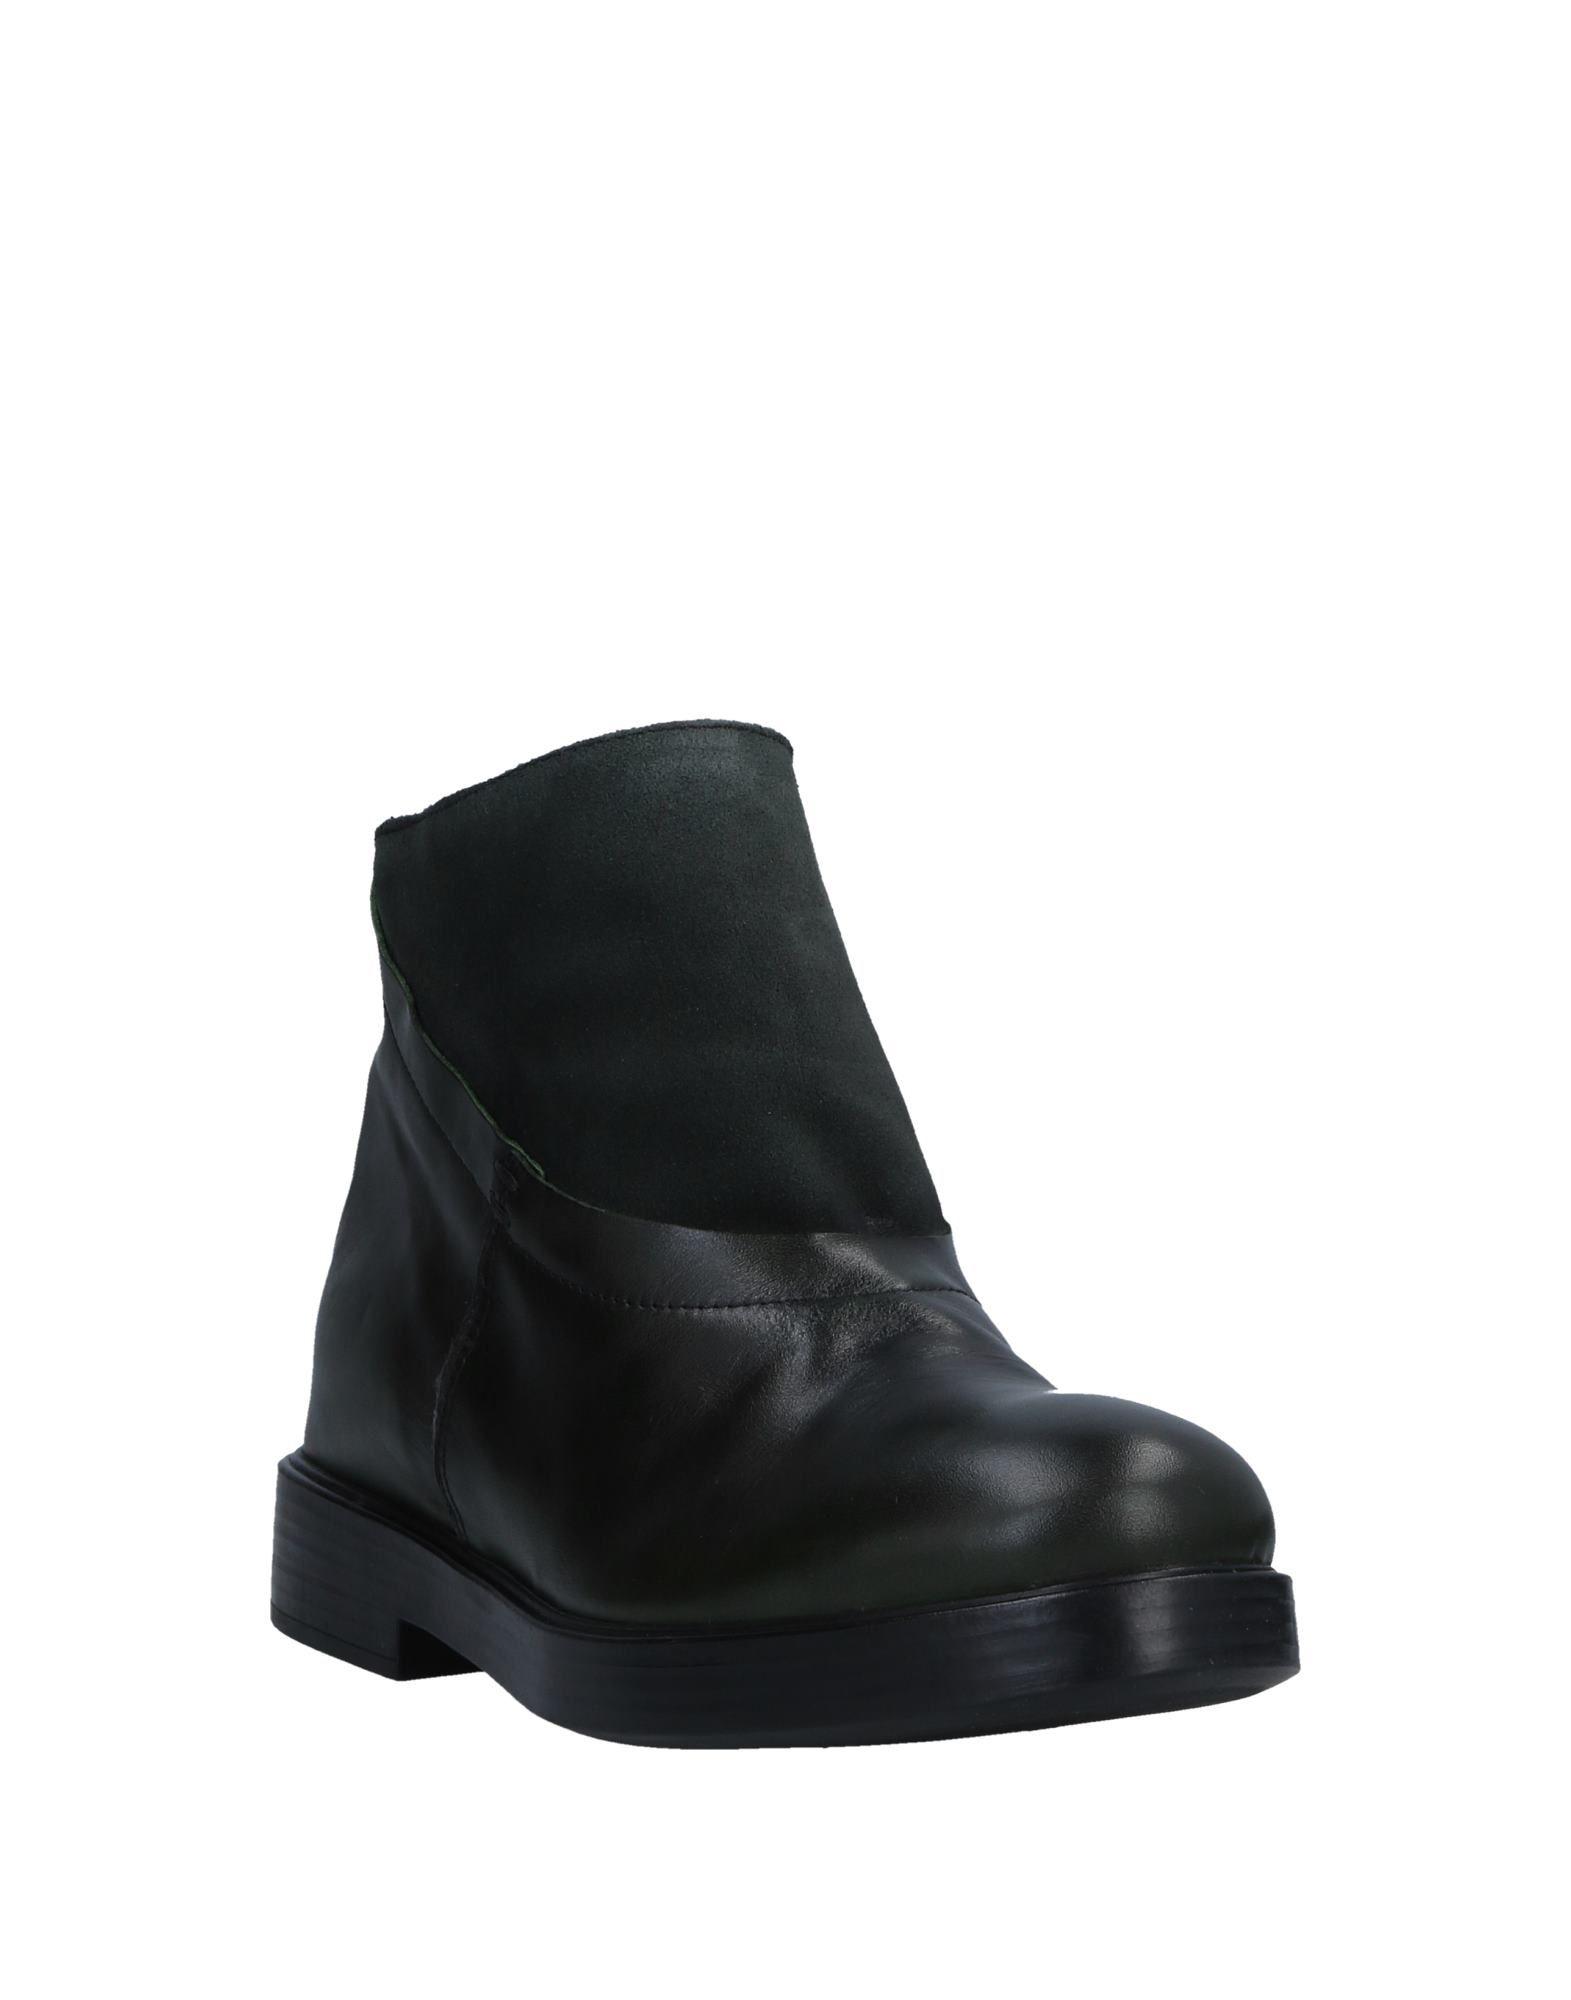 Lilimill Gute Stiefelette Damen  11522309CE Gute Lilimill Qualität beliebte Schuhe b98c0c